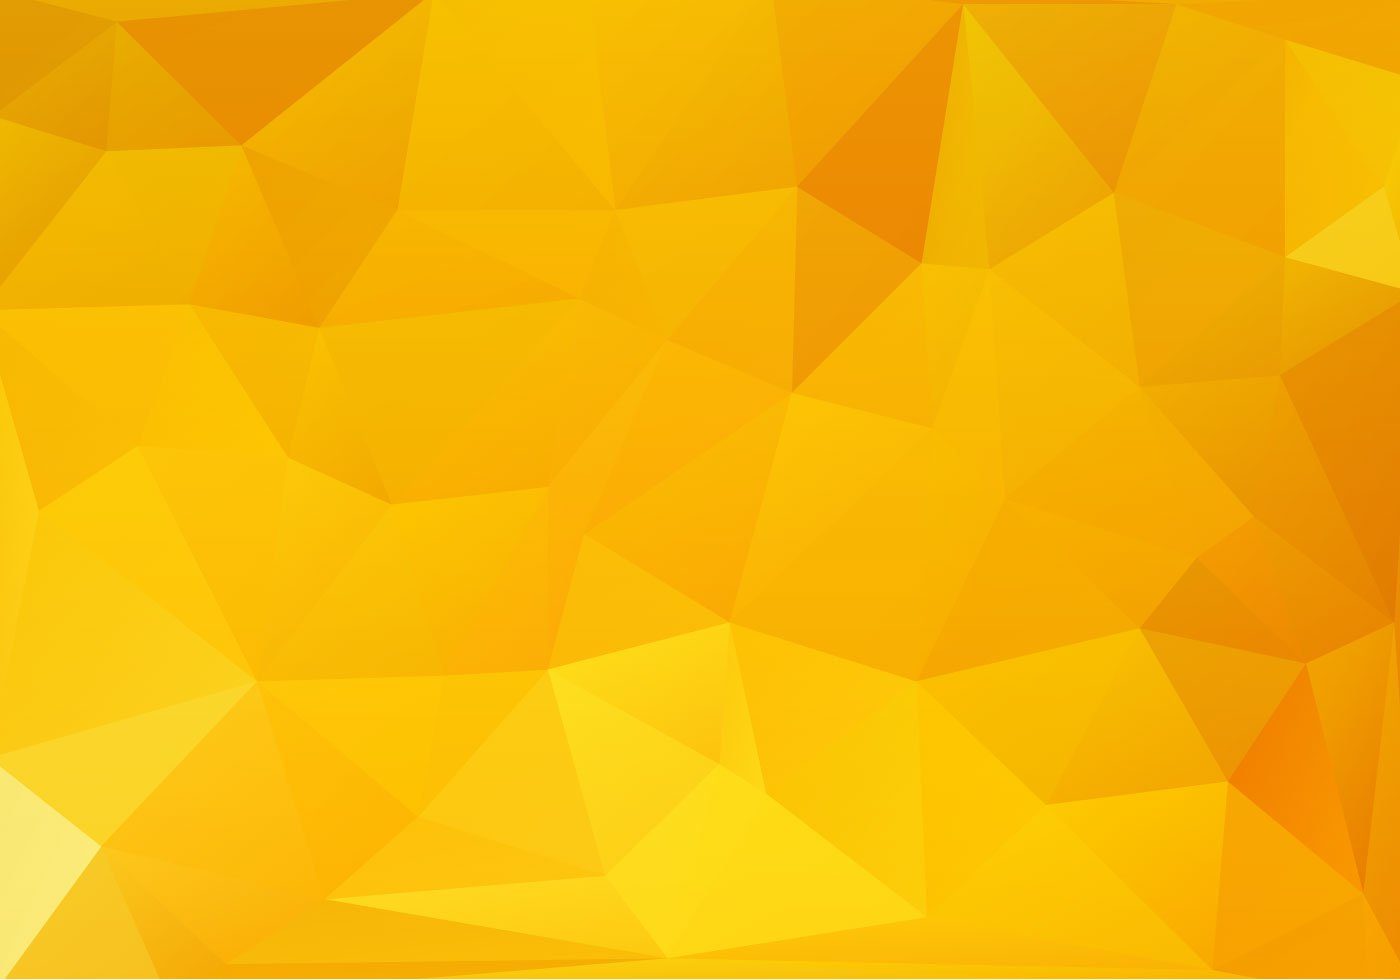 Fondos Variados..... - Página 14 Vector-yellow-abstract-background